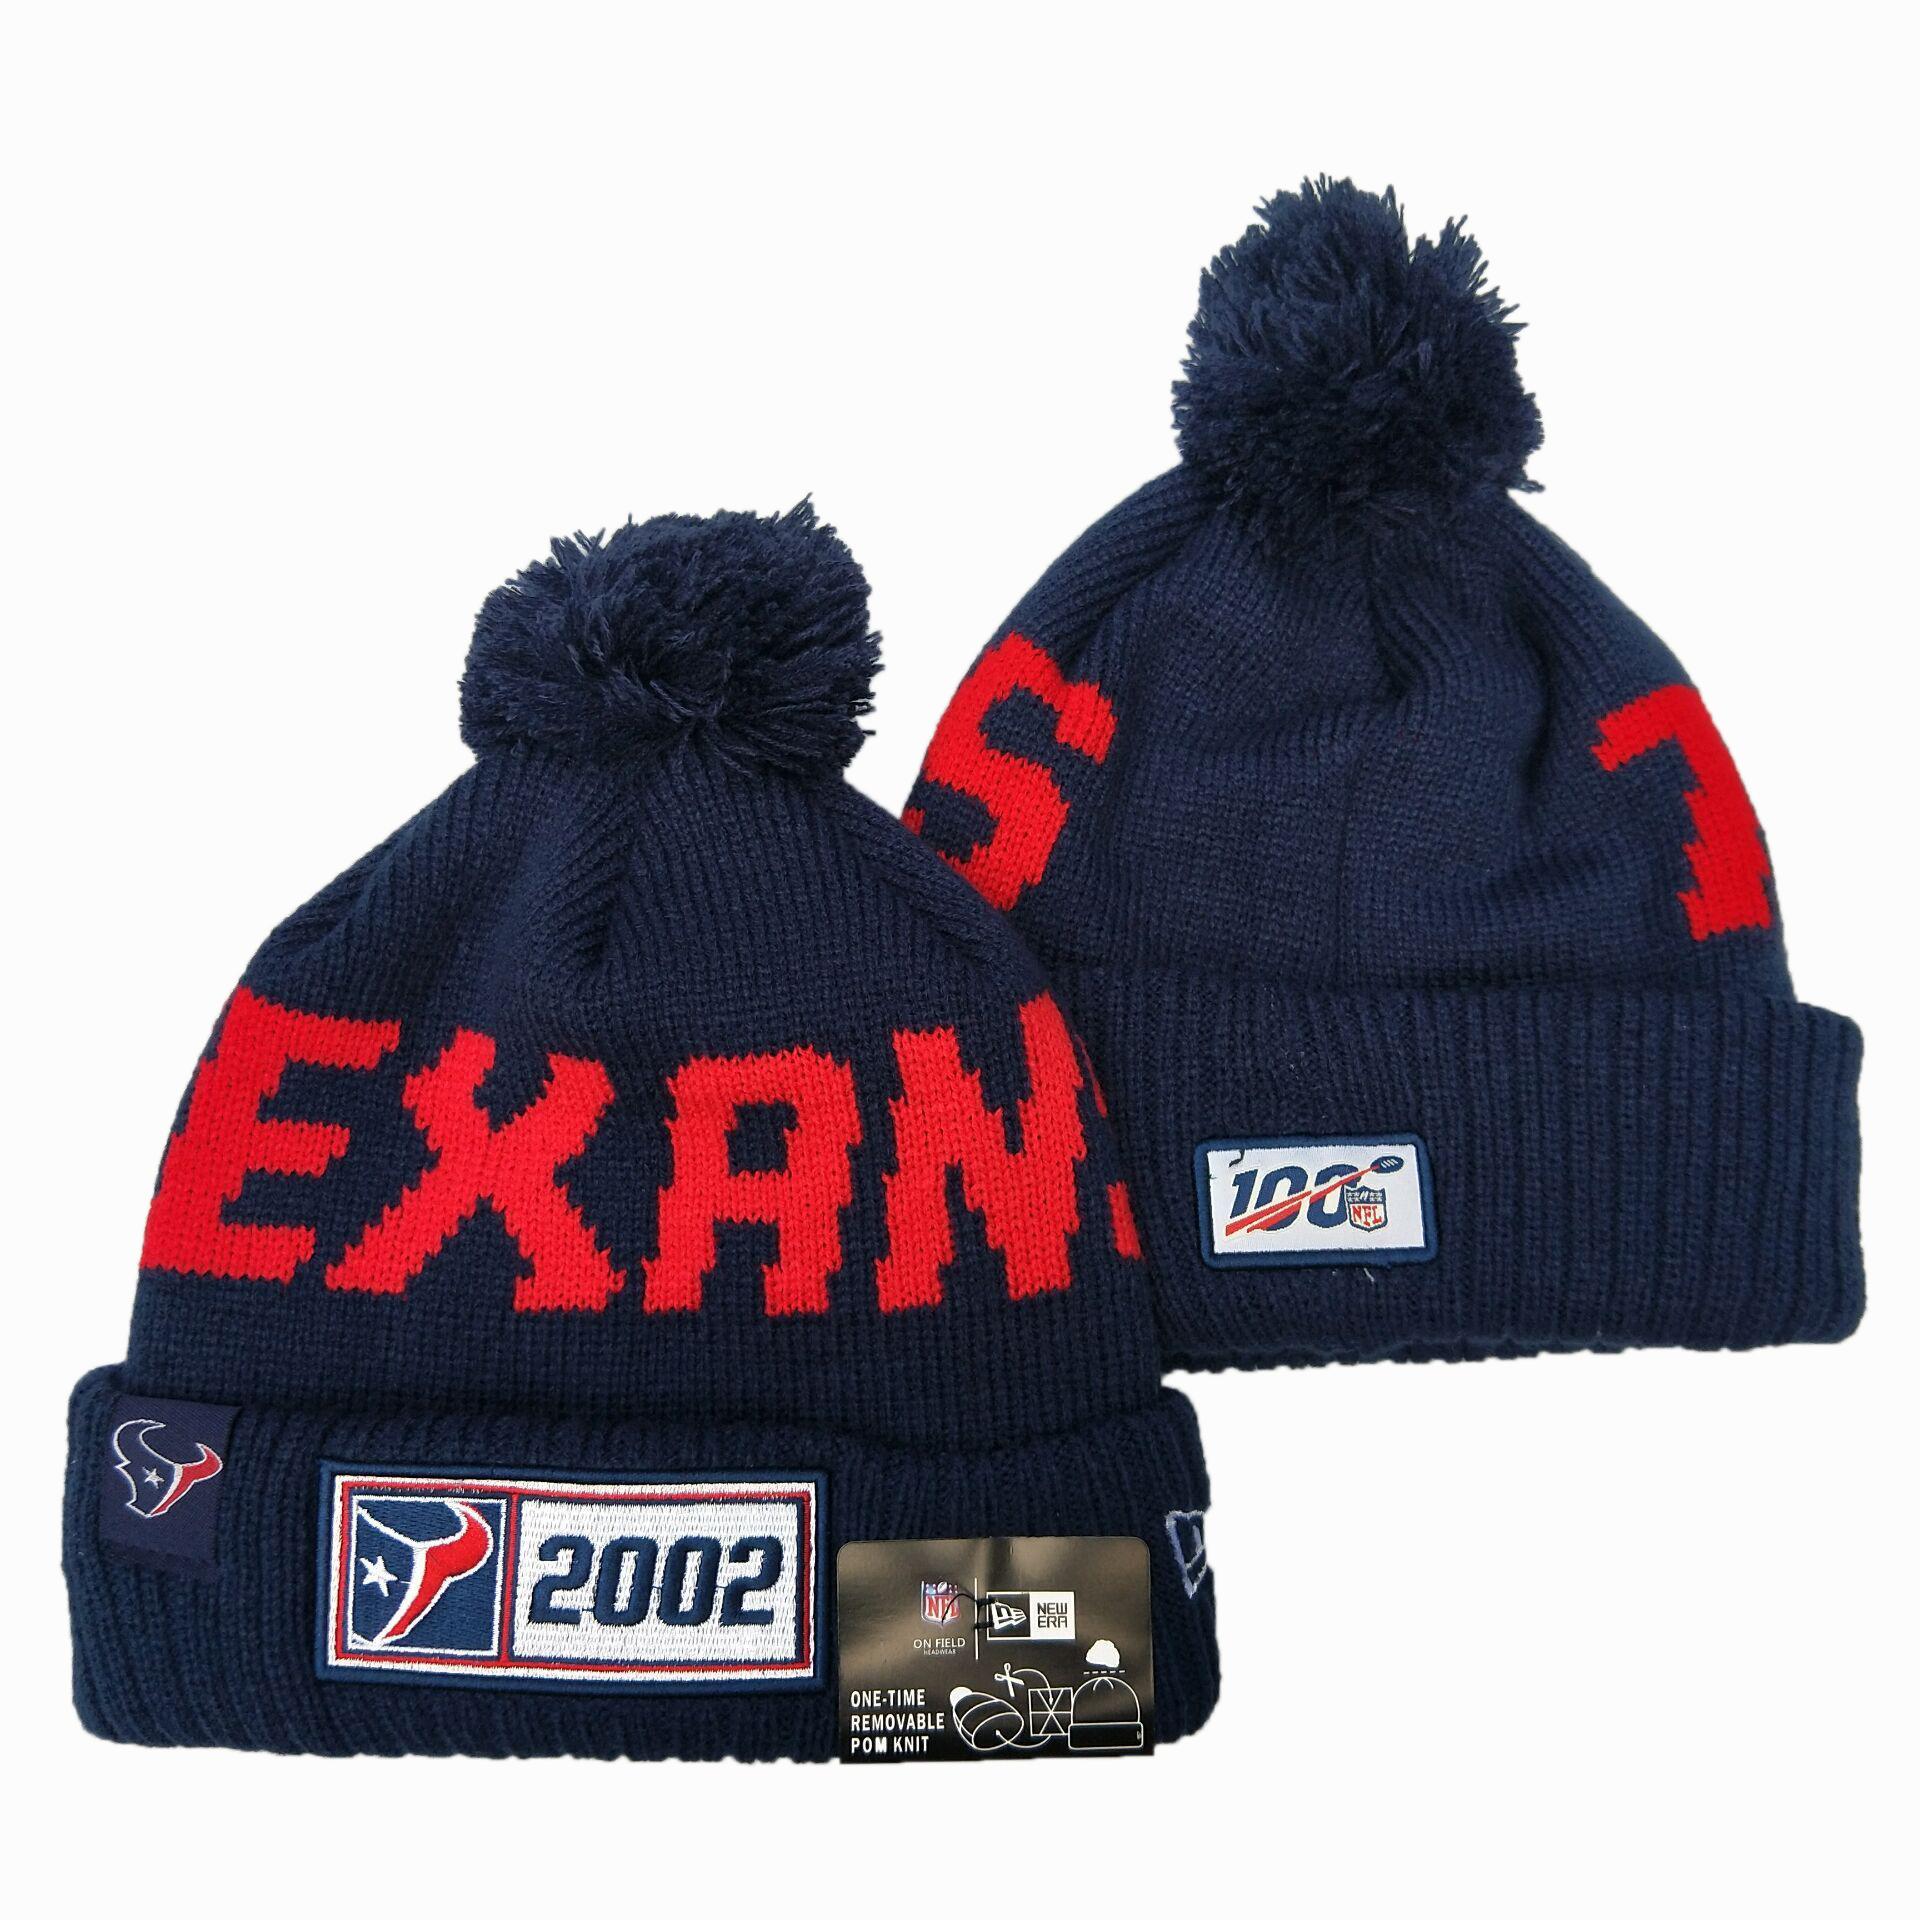 Texans Team Logo Navy 100th Season Pom Knit Hat YD